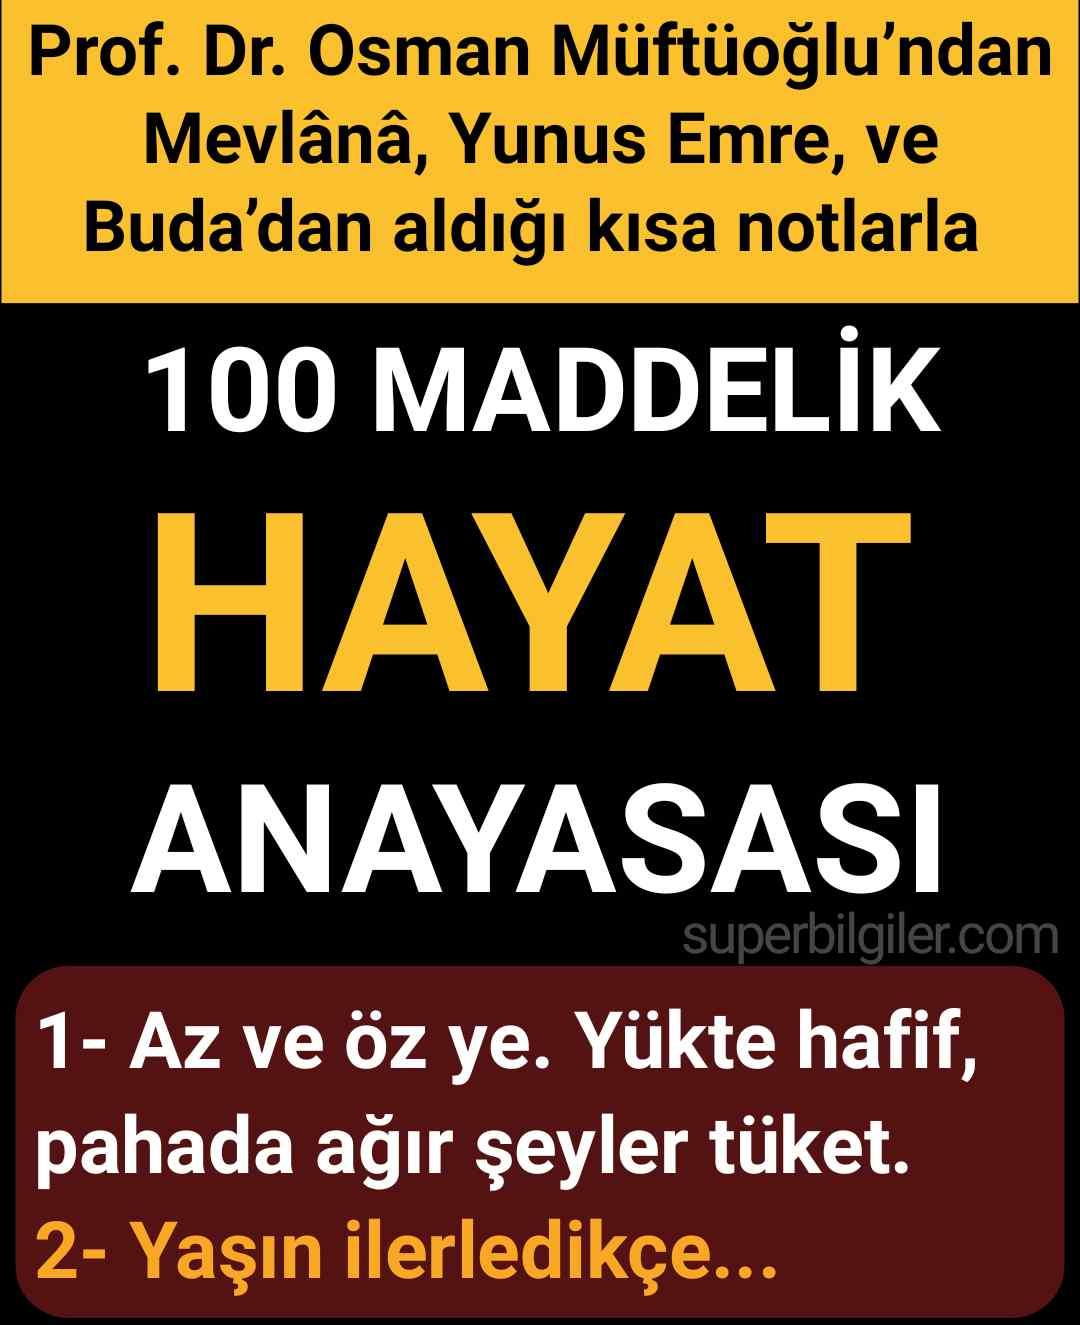 osman muftuoglu hayat anayasasi